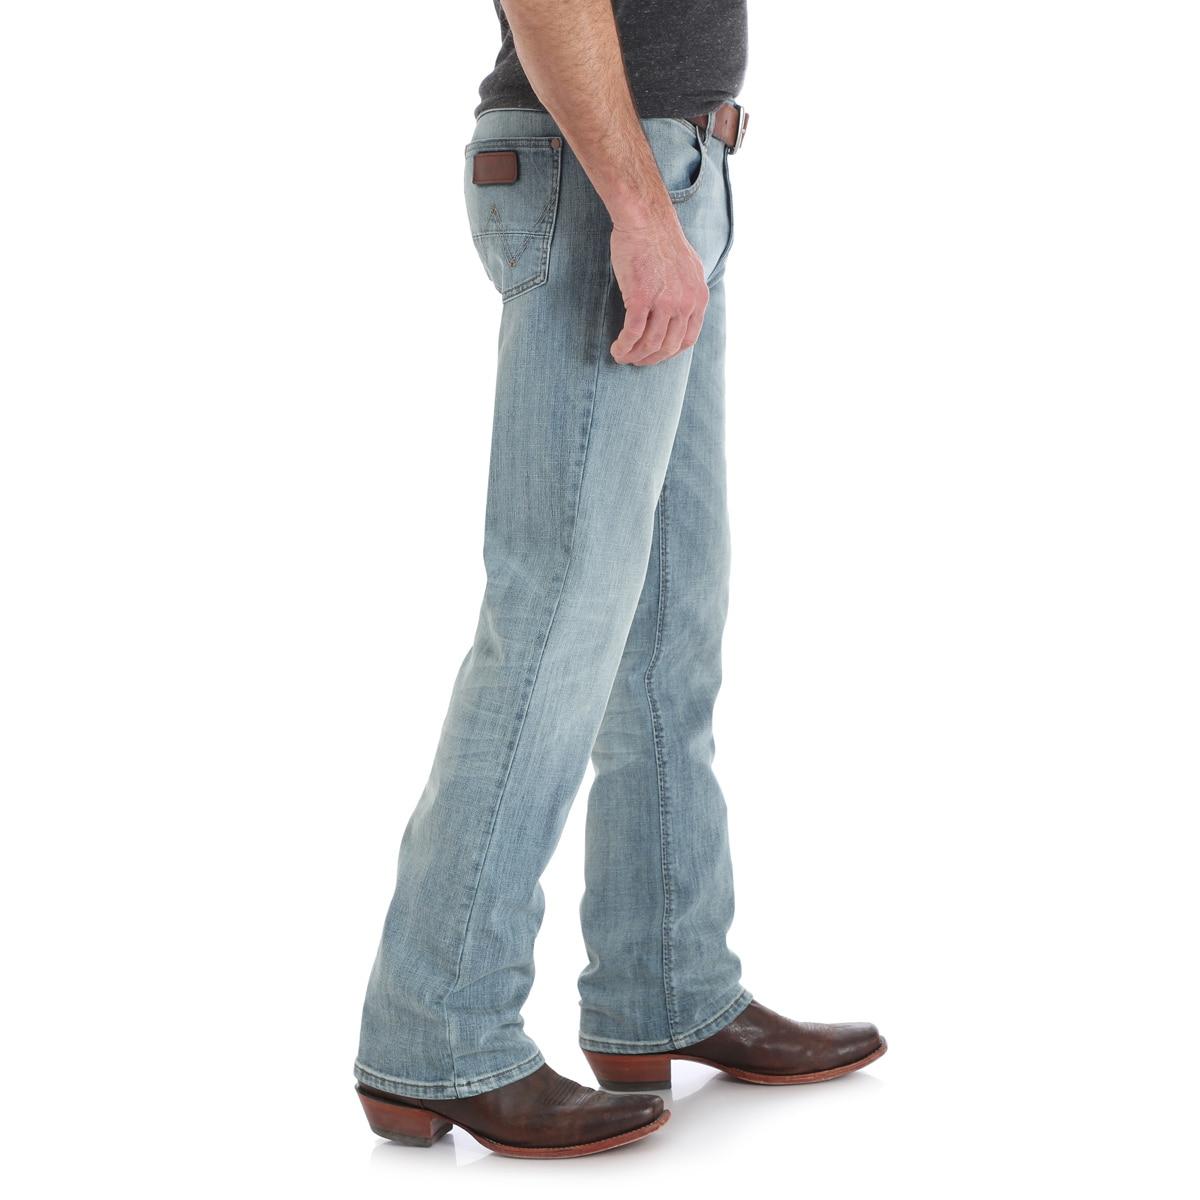 c8557181 Wrangler Men's Retro® Slim Fit Bootcut Jeans - BR Wash